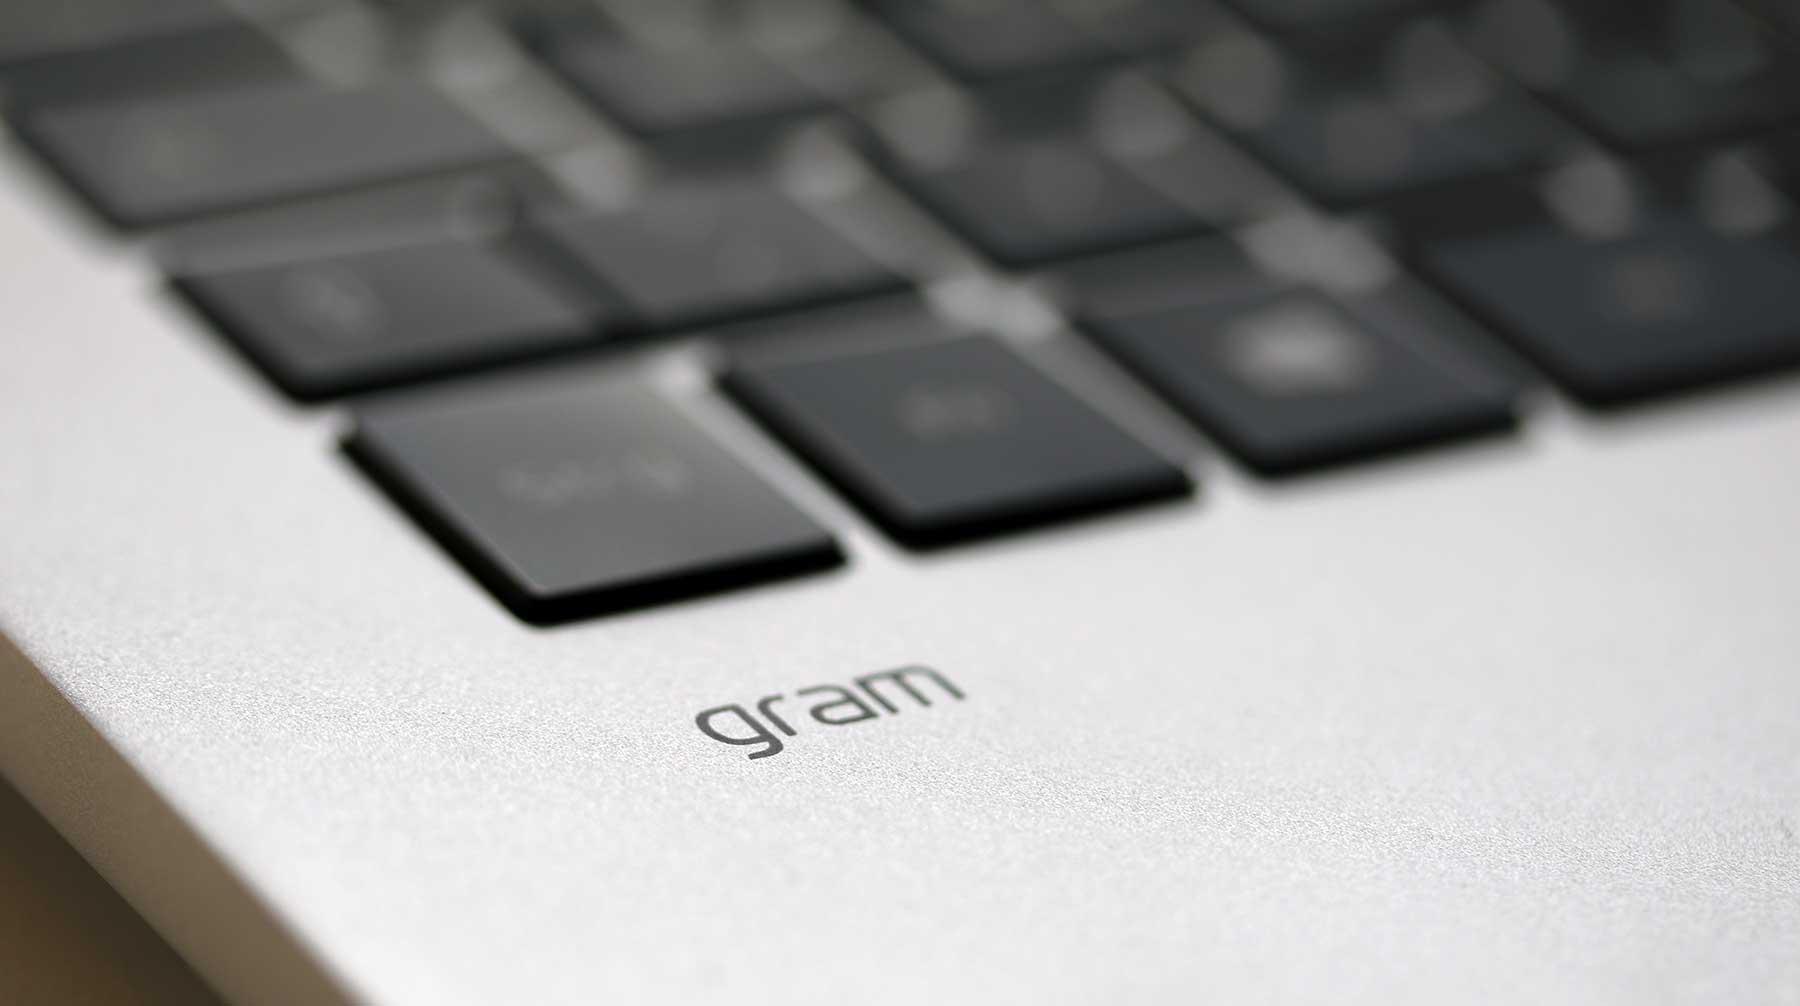 Laptop-Testbericht: Neues LG gram 17-Zoll-Notebook (2021er Version) LG-gram-17_2021_Testbericht_07